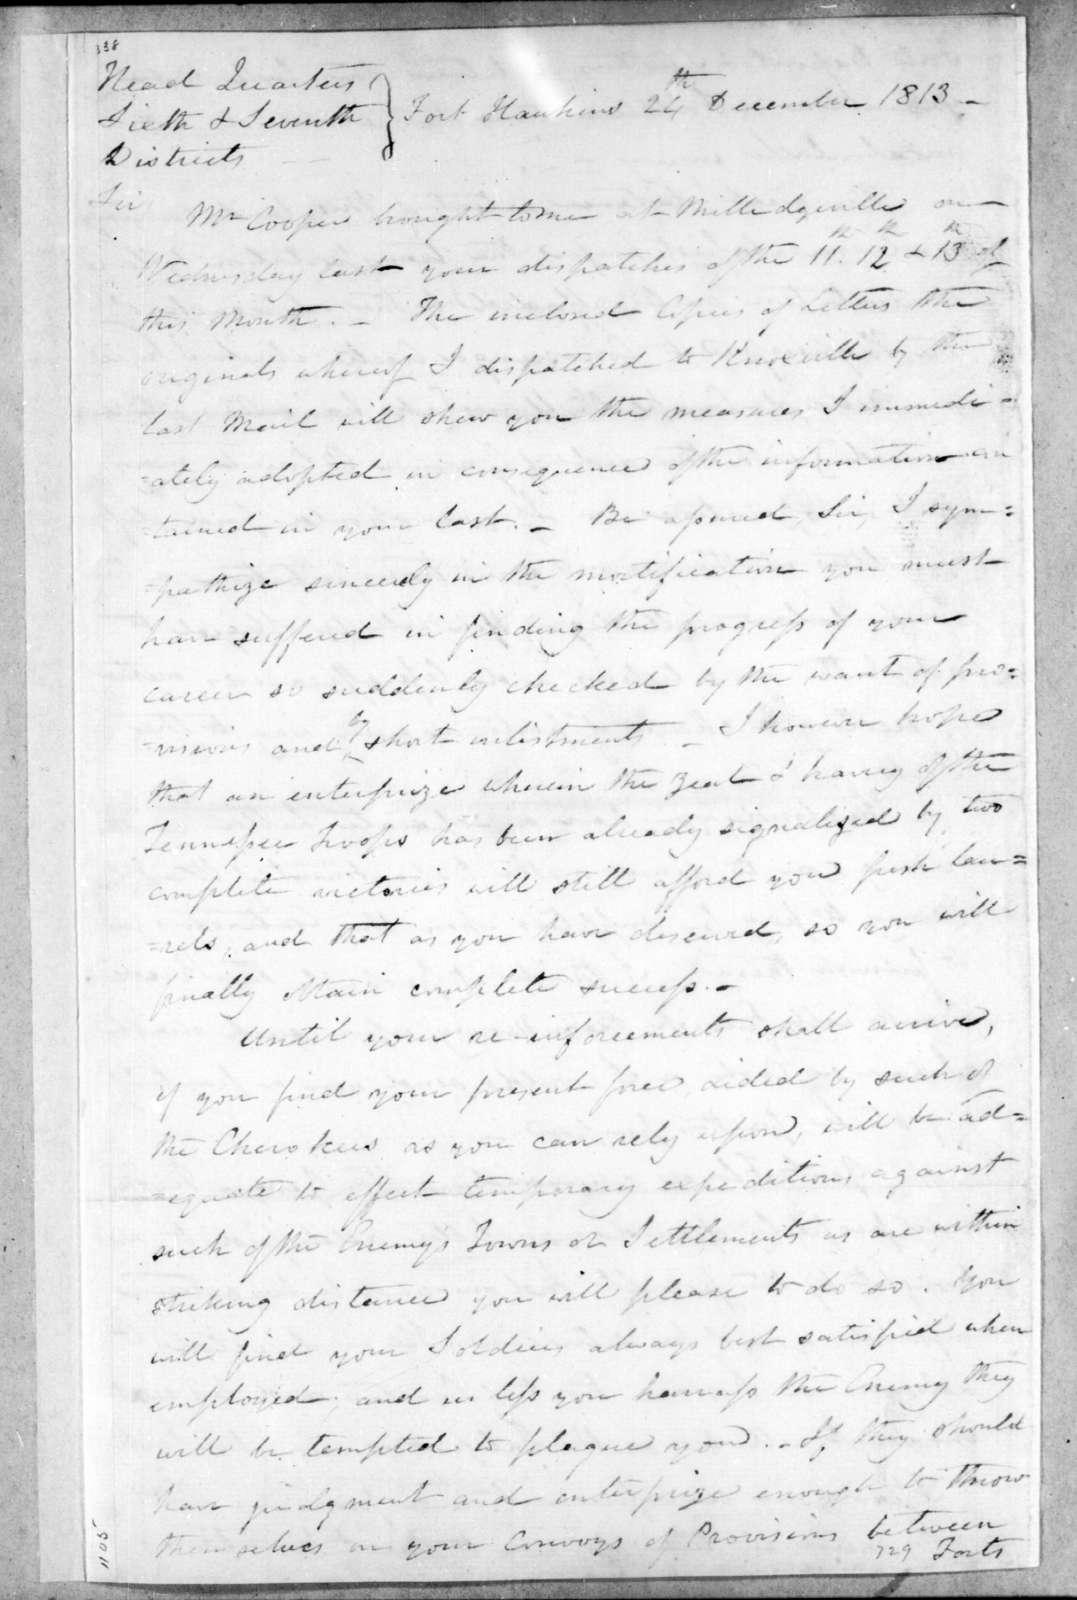 Thomas Pinckney to Andrew Jackson, December 24, 1813